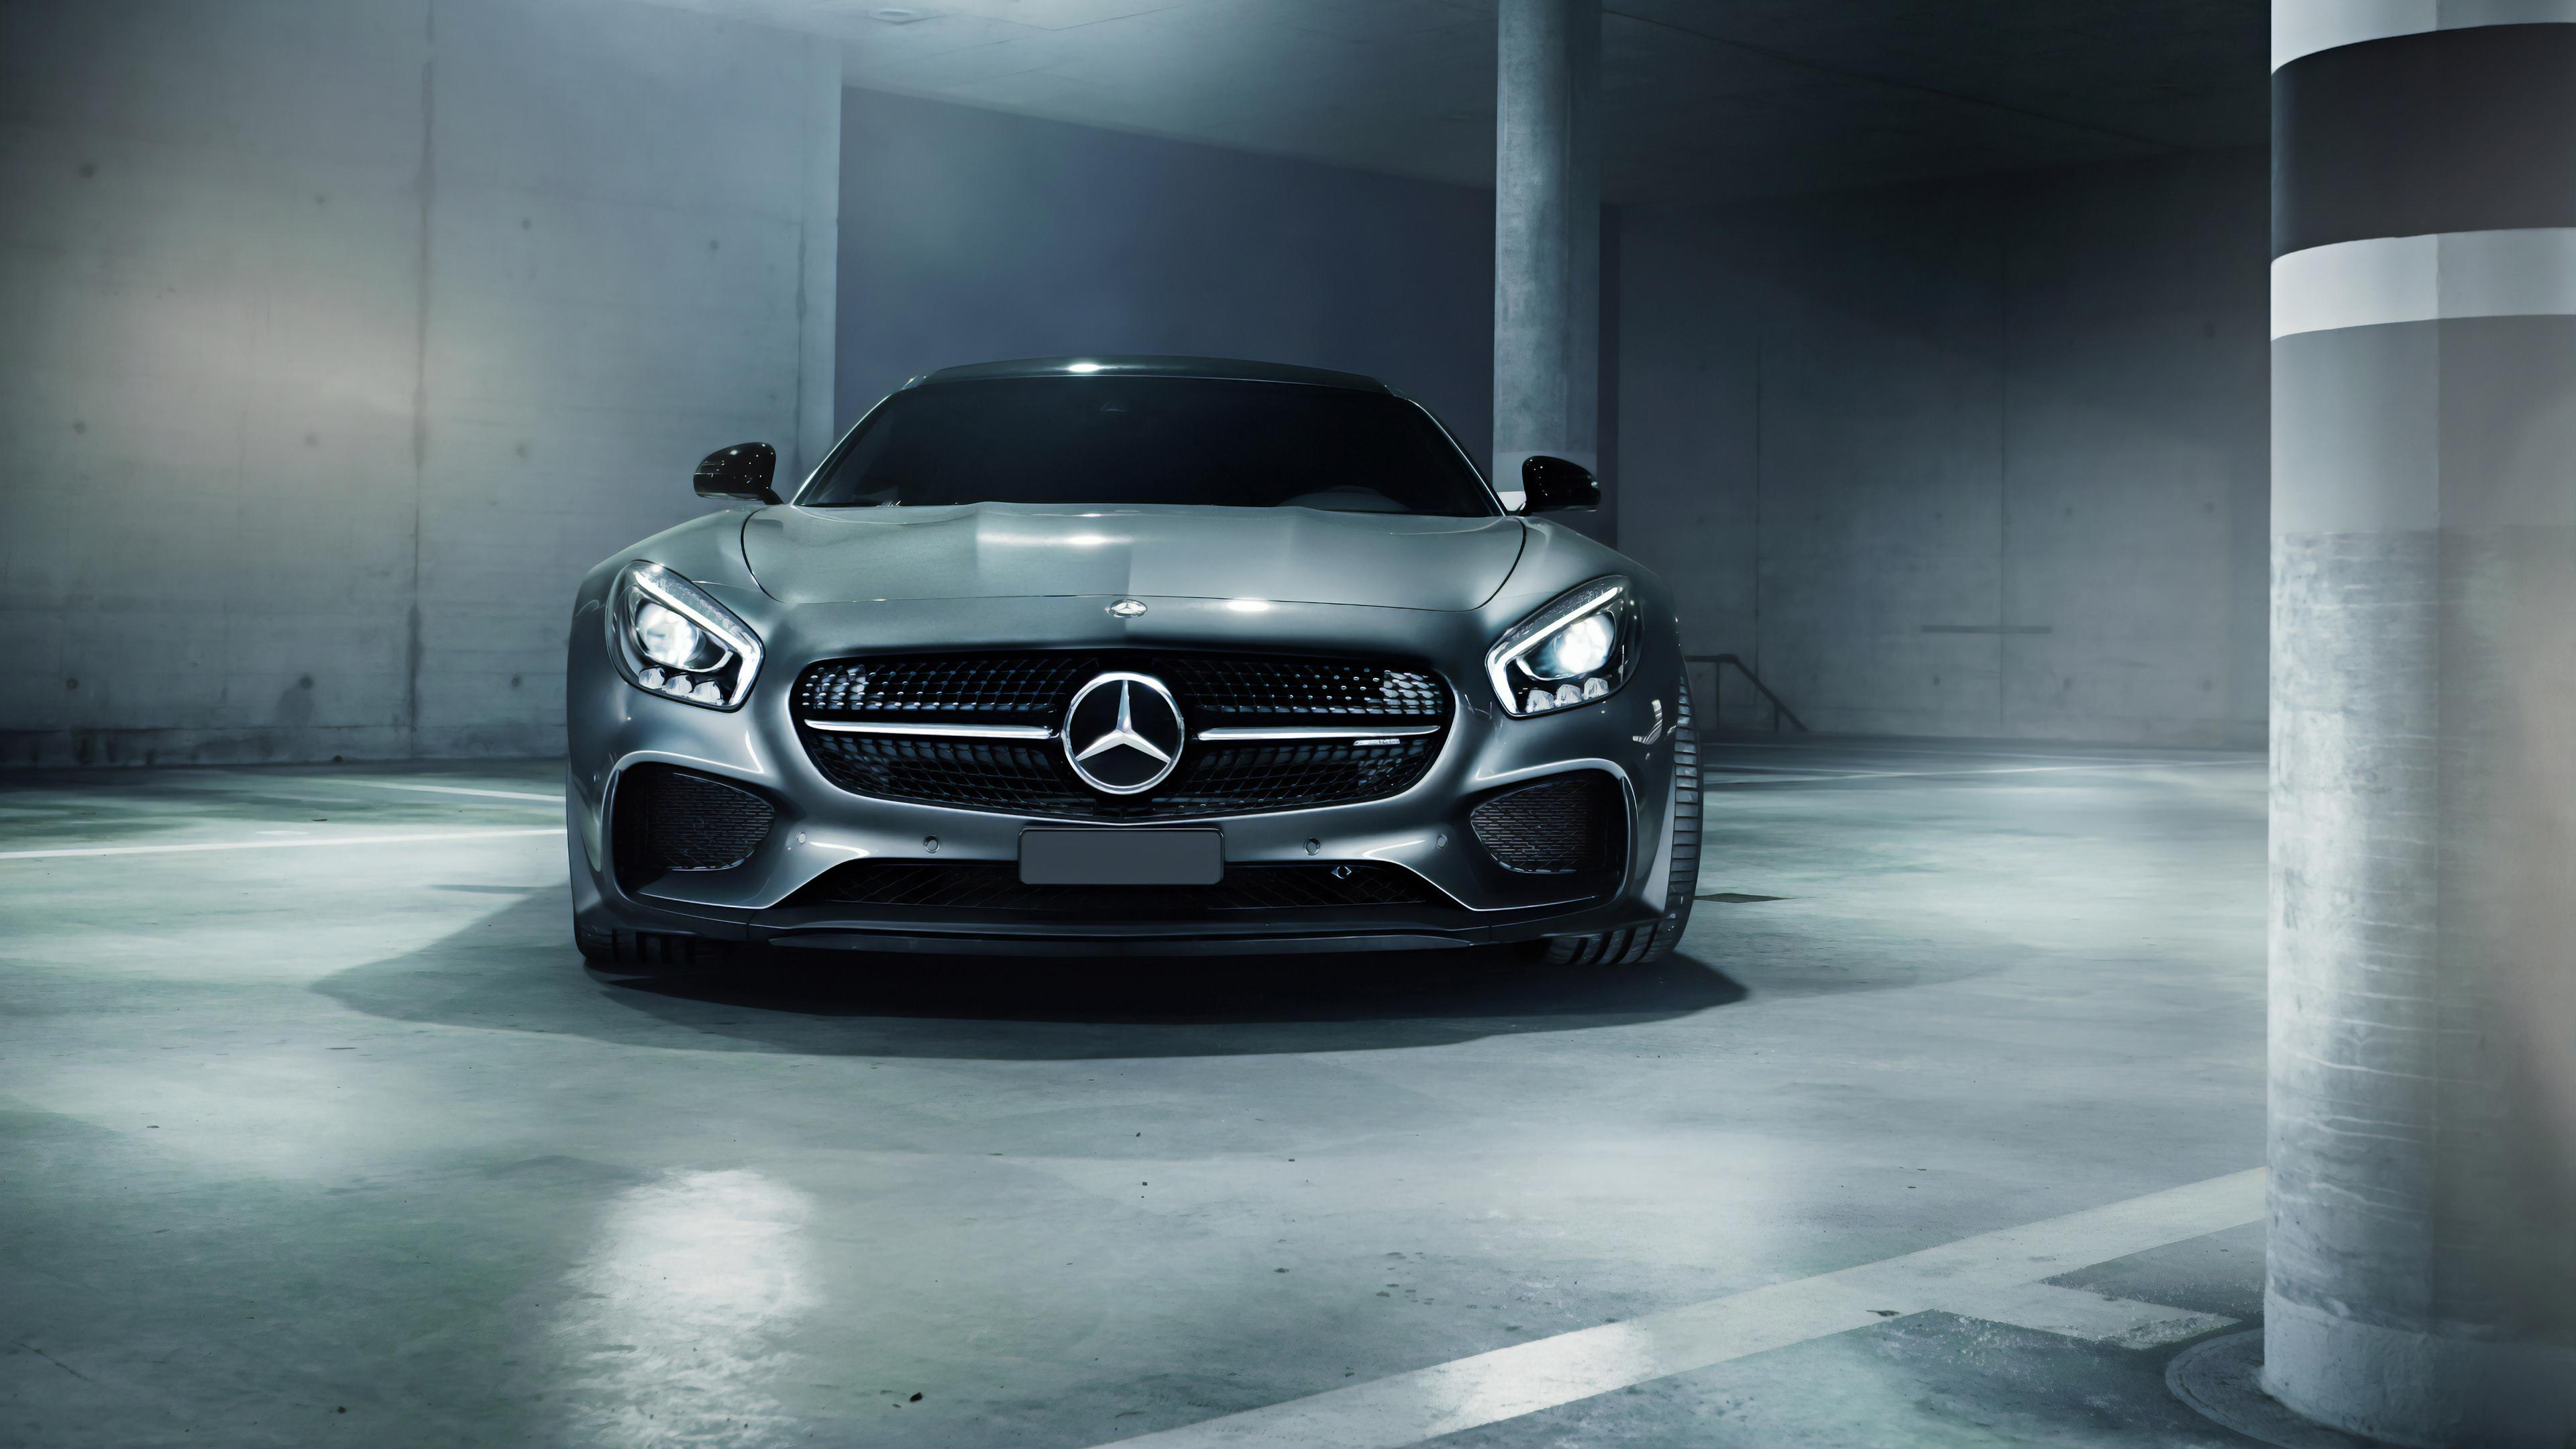 grey mercedes benz amg gt front 1562108056 - Grey Mercedes Benz Amg GT Front - mercedes wallpapers, mercedes amg gtr wallpapers, hd-wallpapers, cars wallpapers, behance wallpapers, 4k-wallpapers, 2019 cars wallpapers